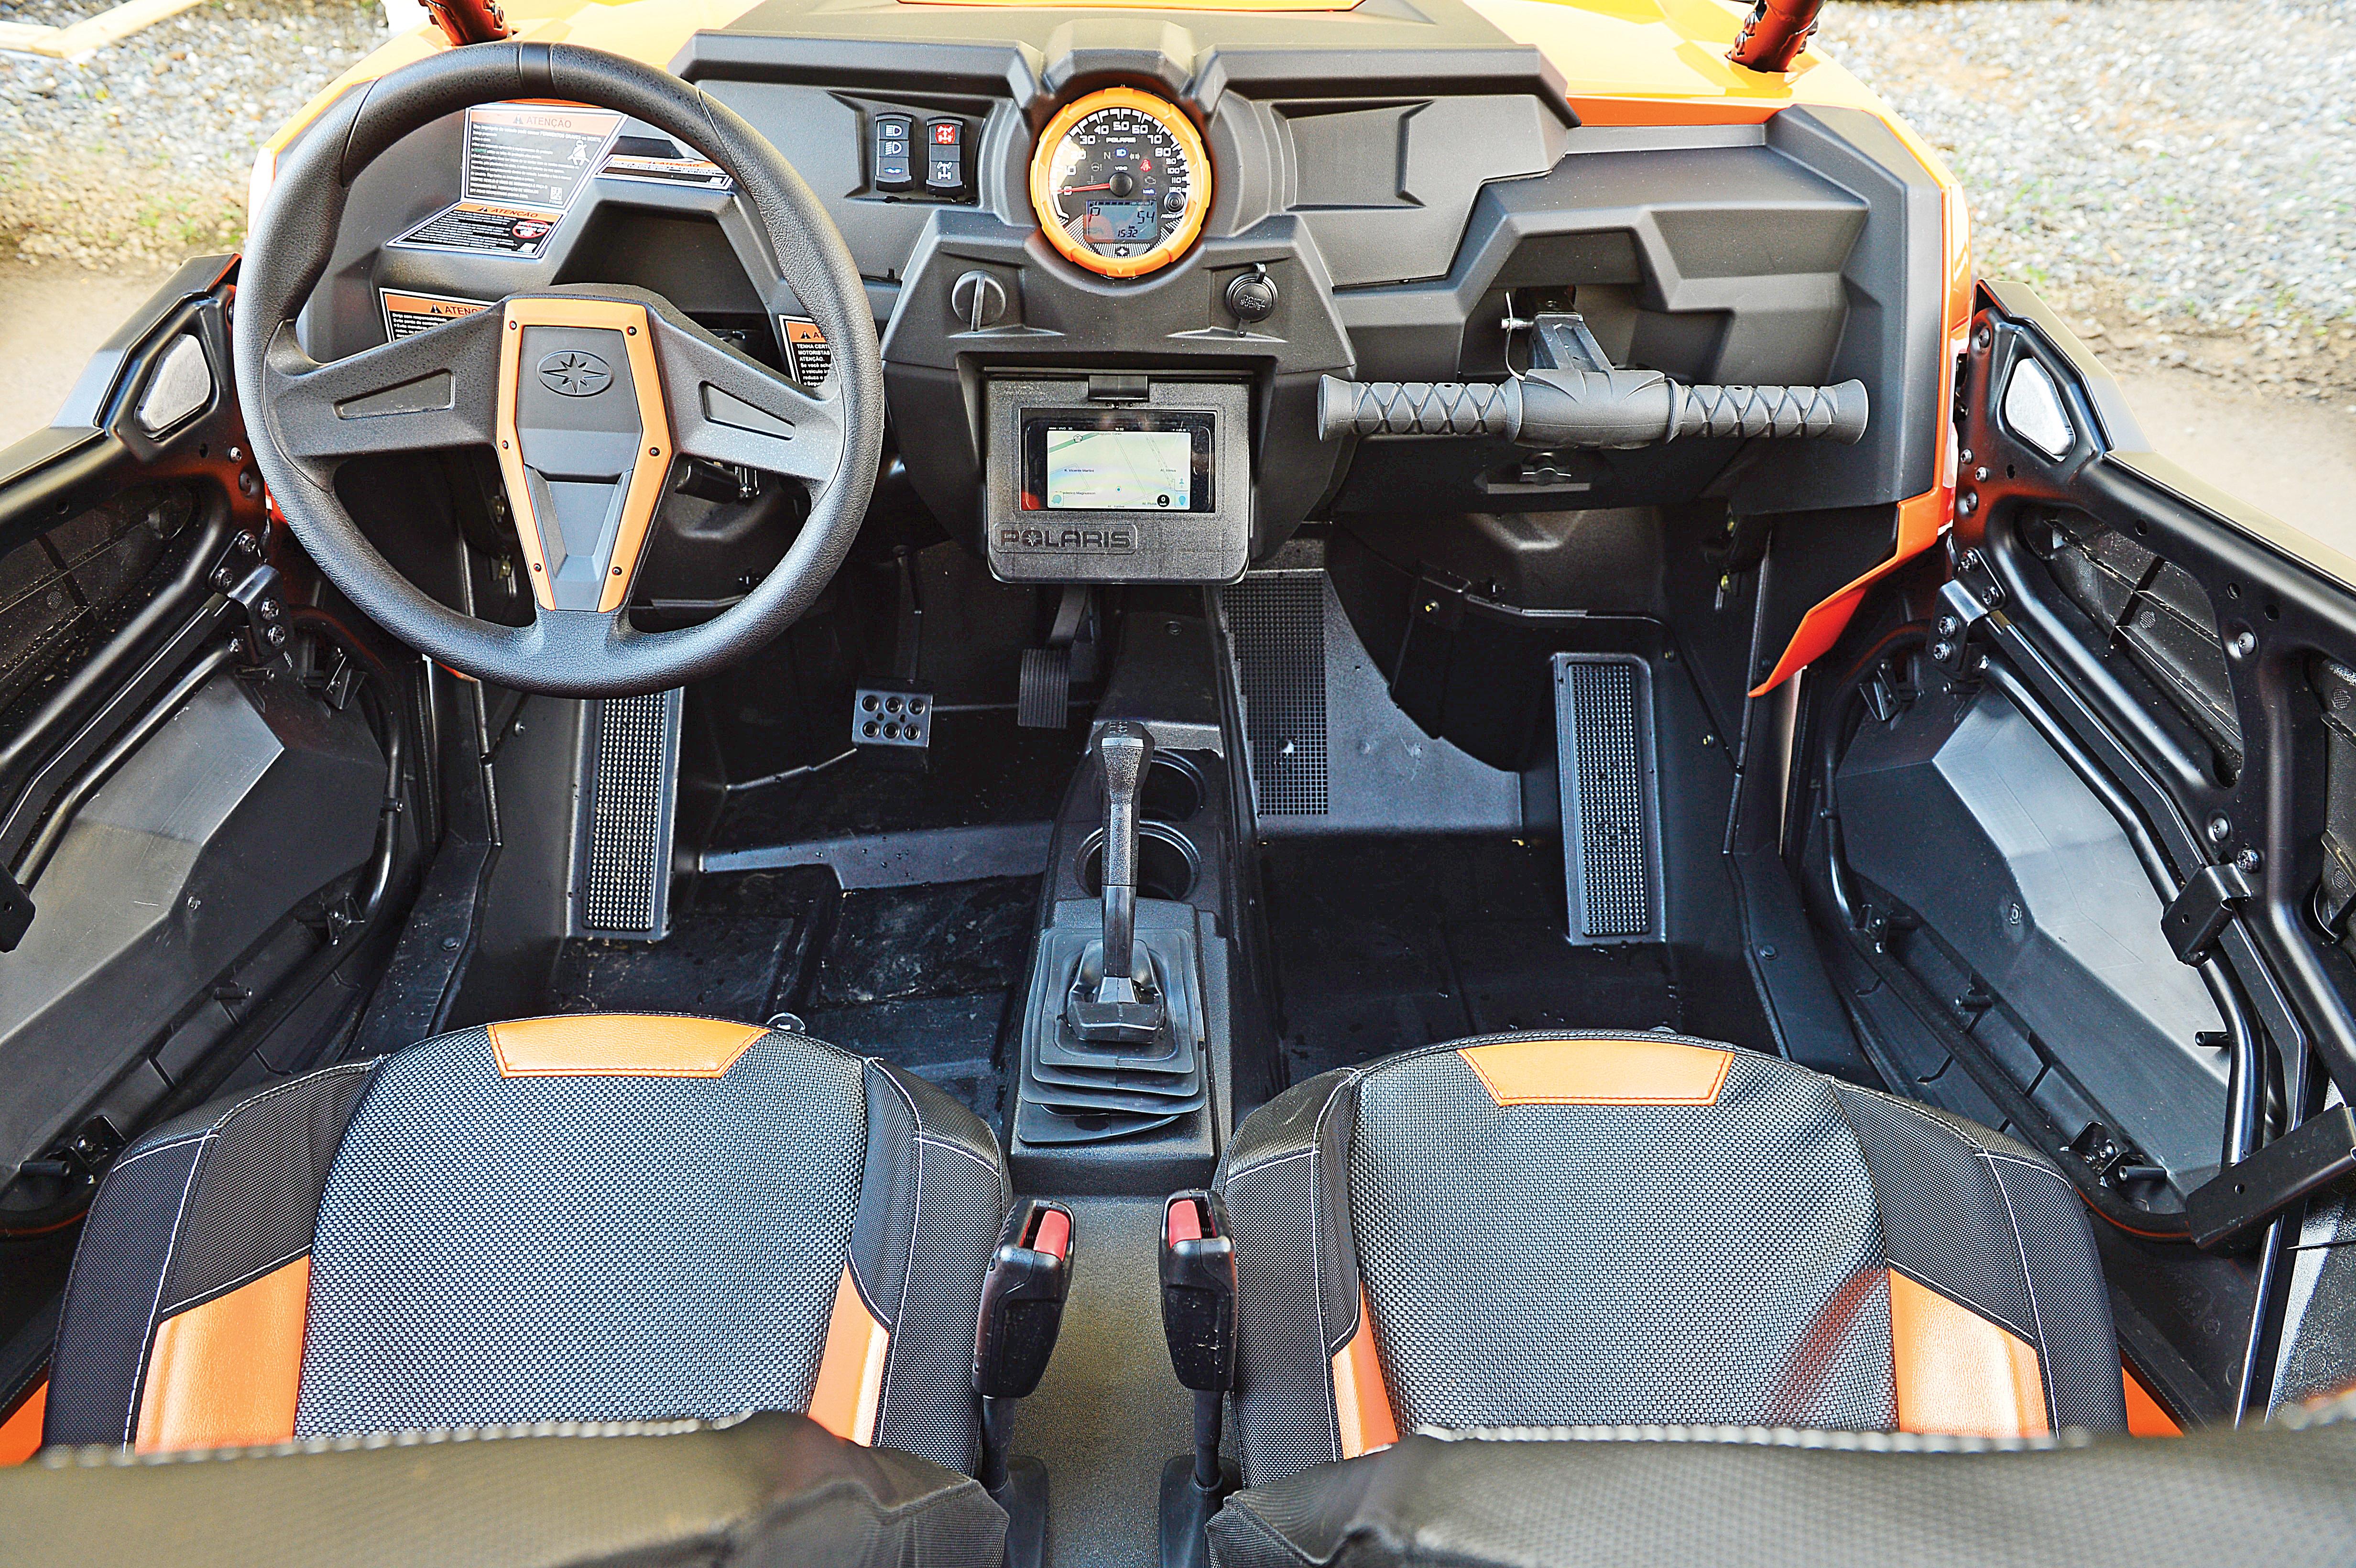 Polaris RZR XP Turbo 02